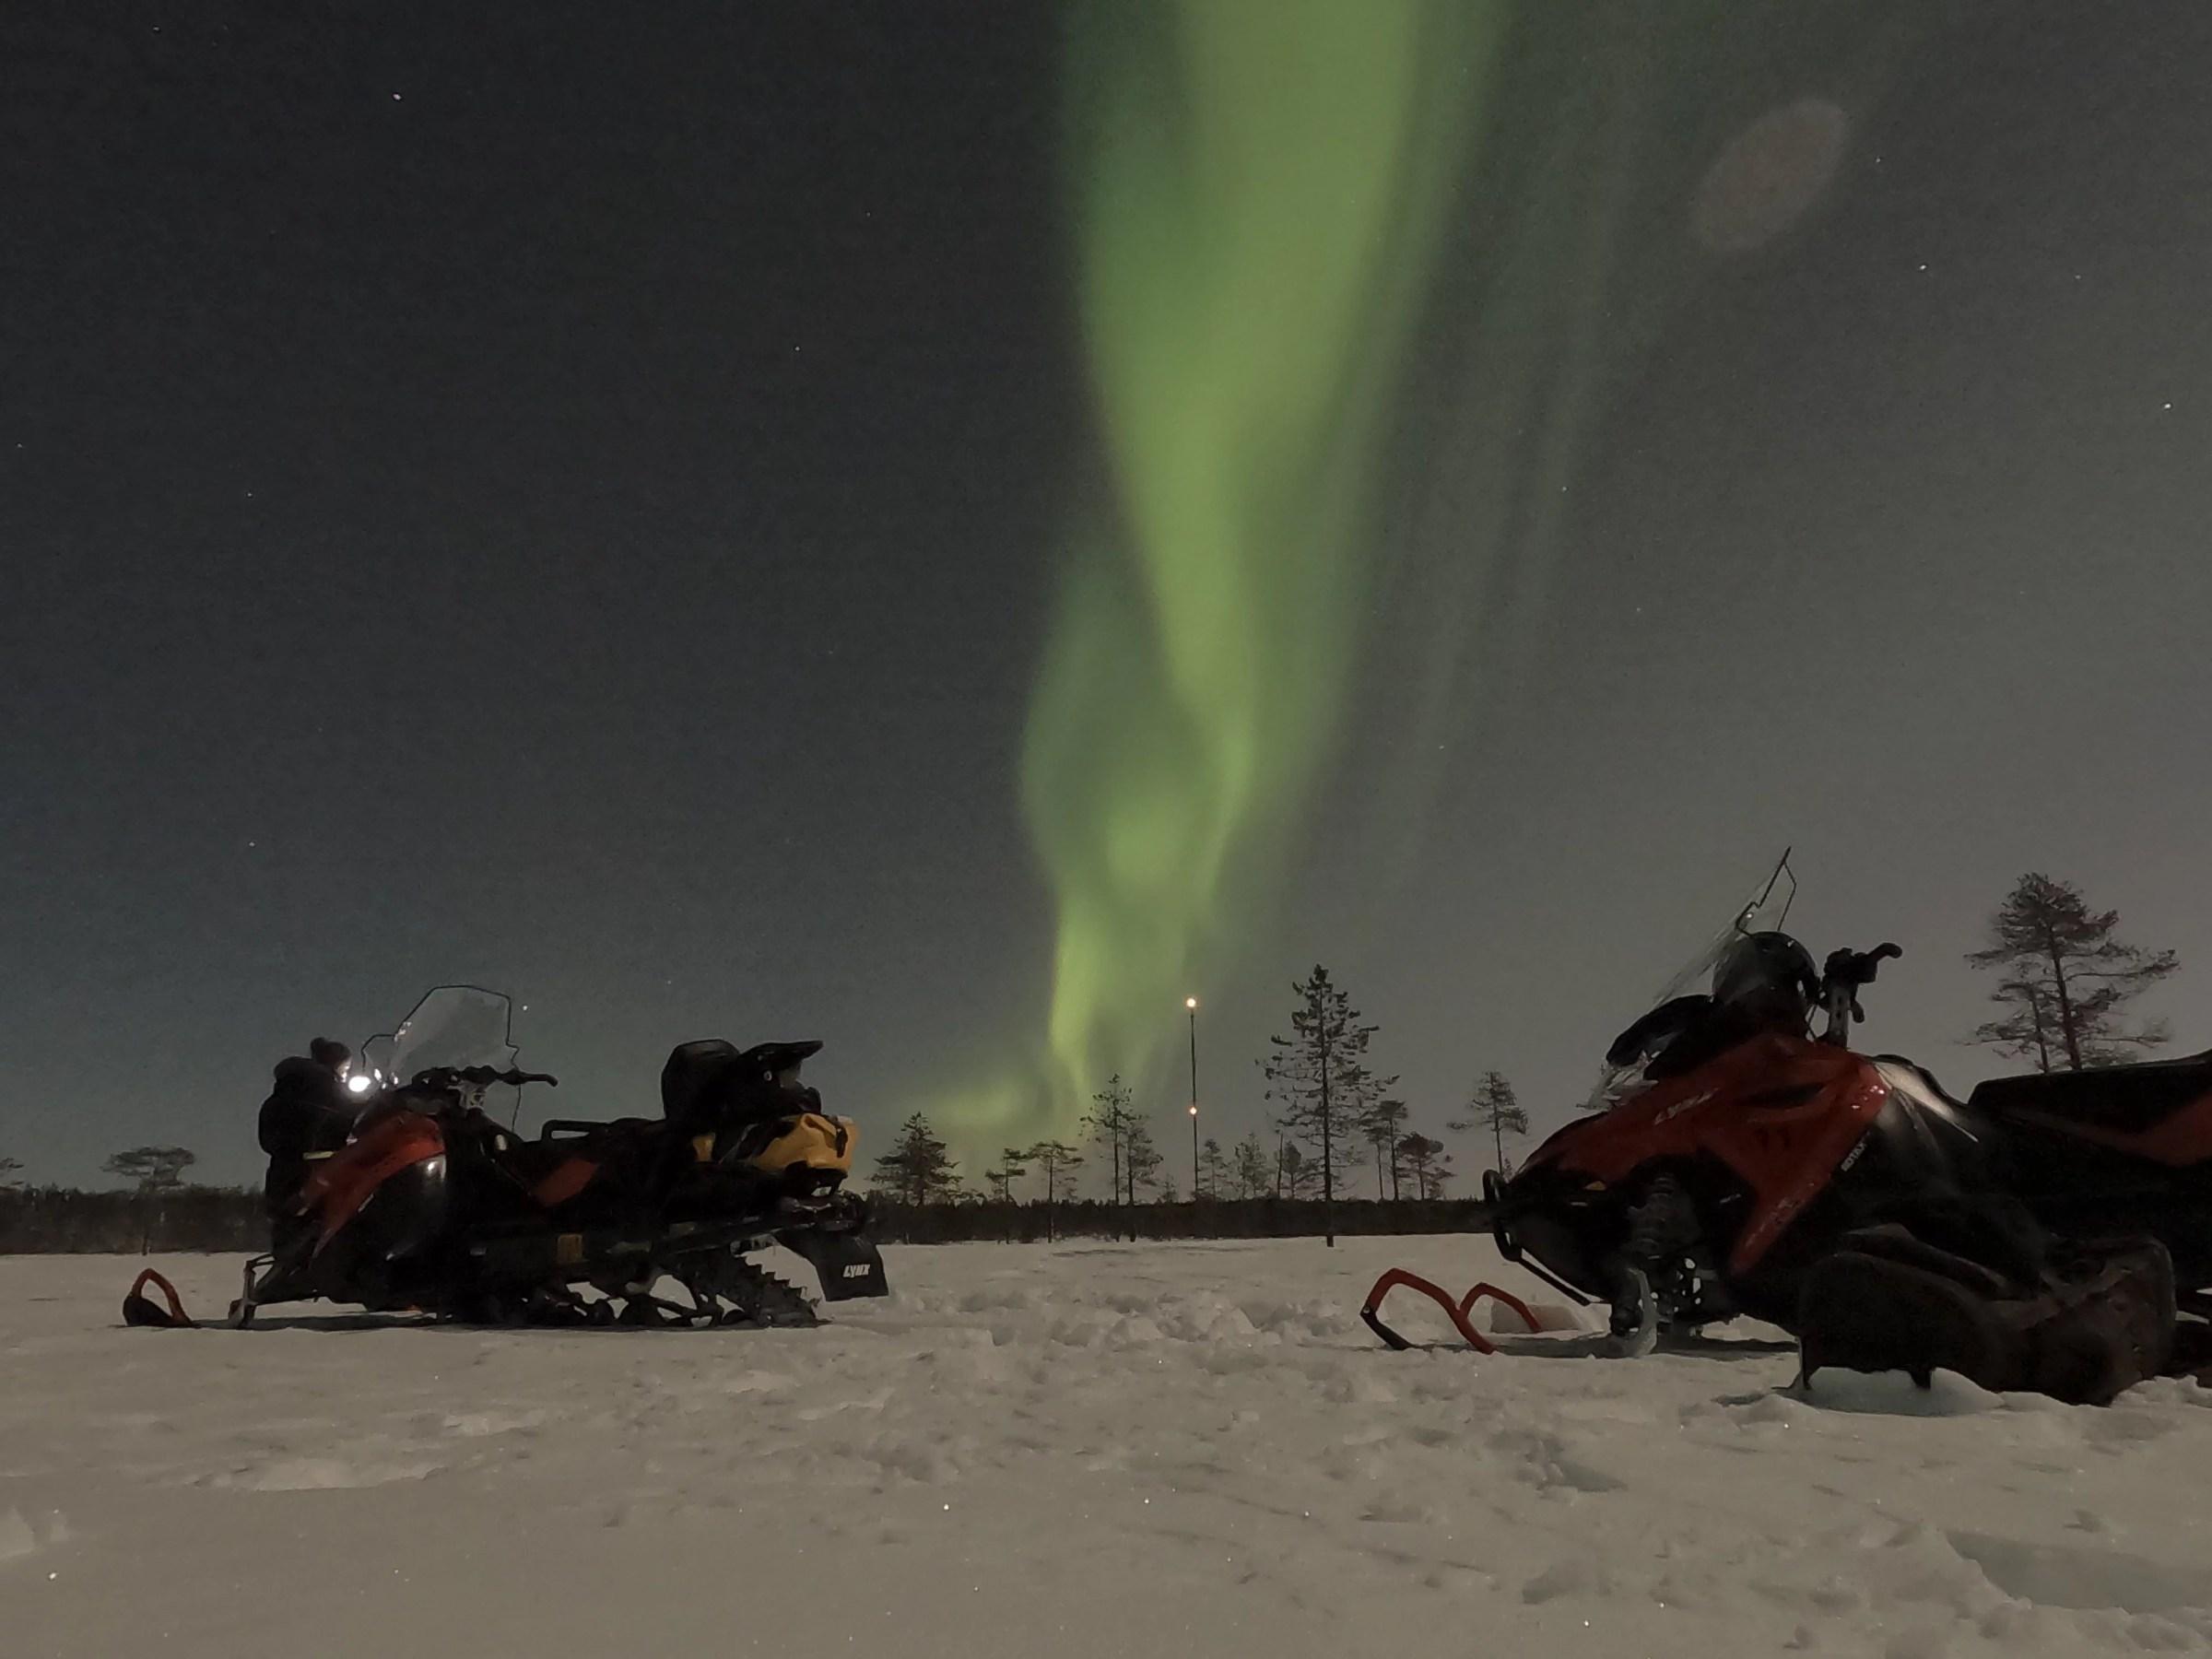 northern light by snowmobile rovaniemi